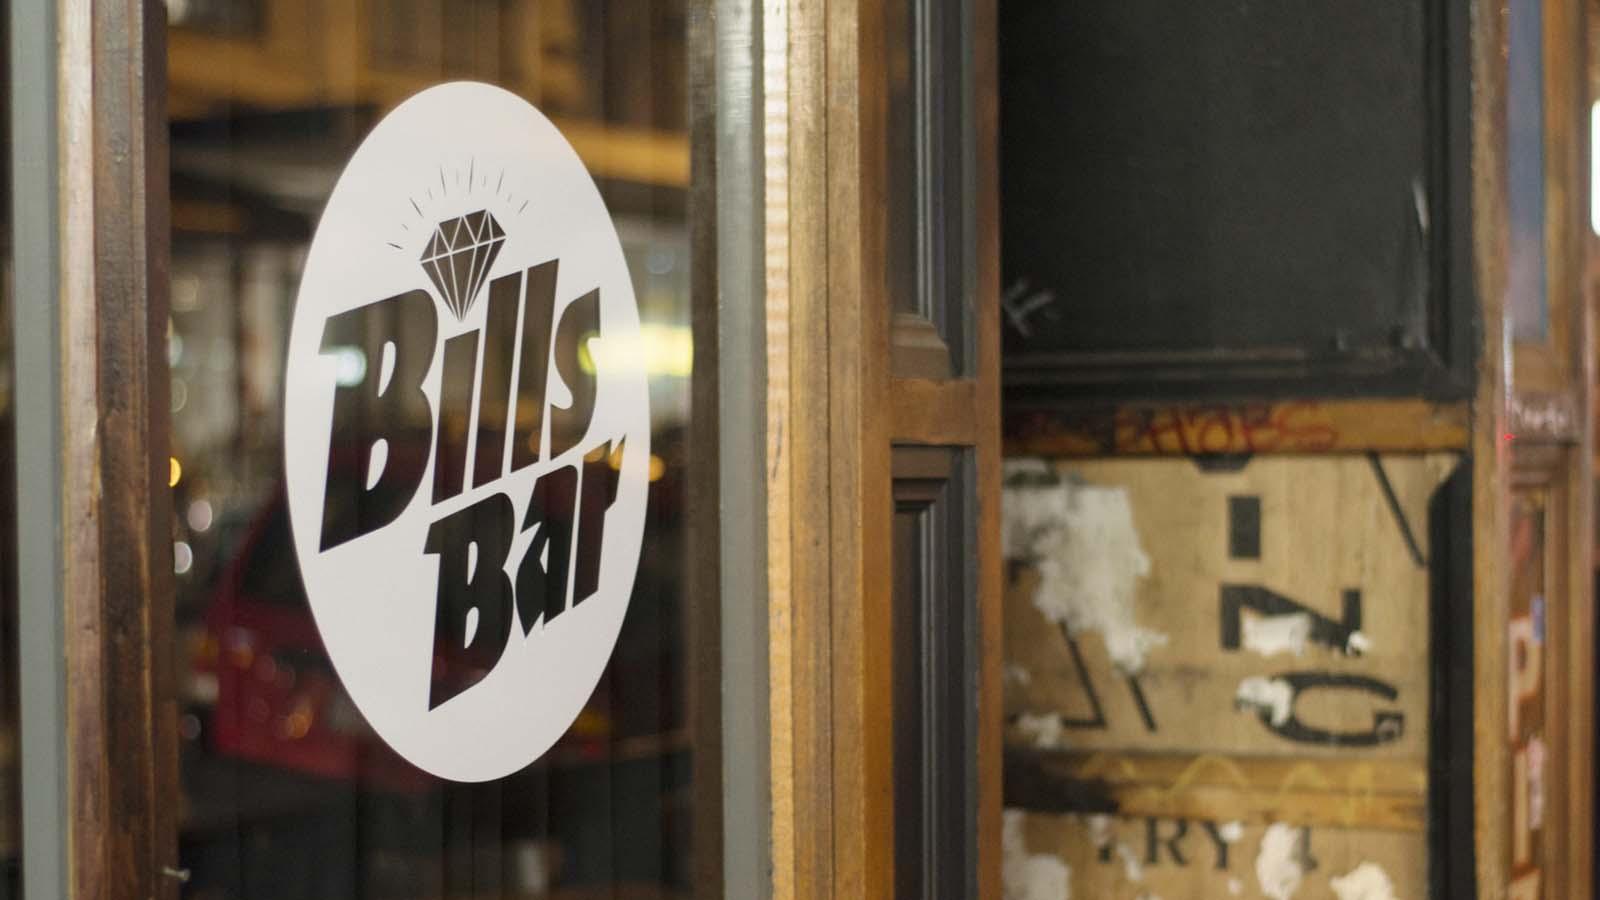 Bills Bar, Collingwood, Melbourne, Victoria, Australia